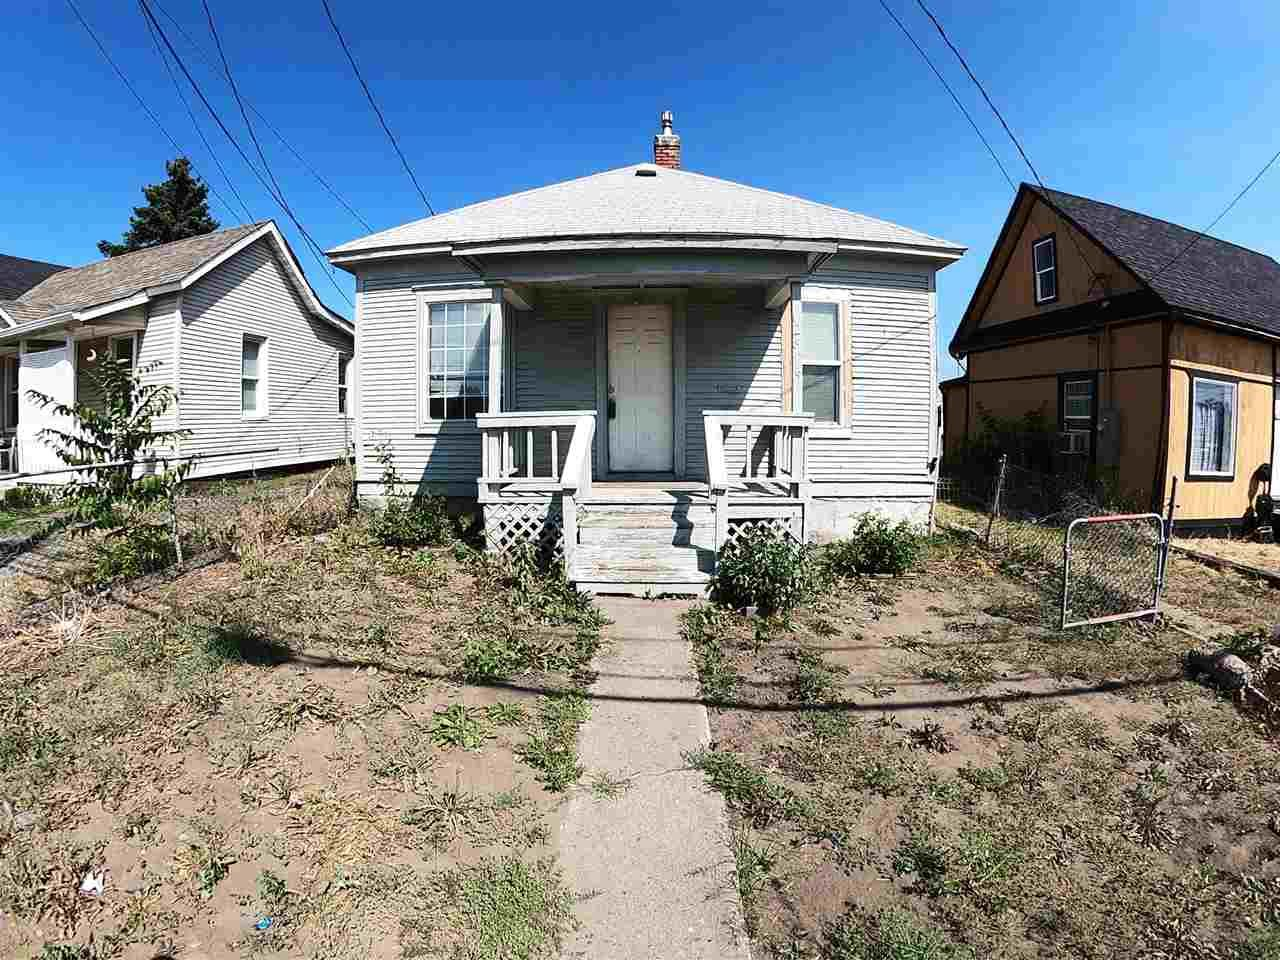 2806 N Standard St, Spokane, WA 99207 - #: 202019371